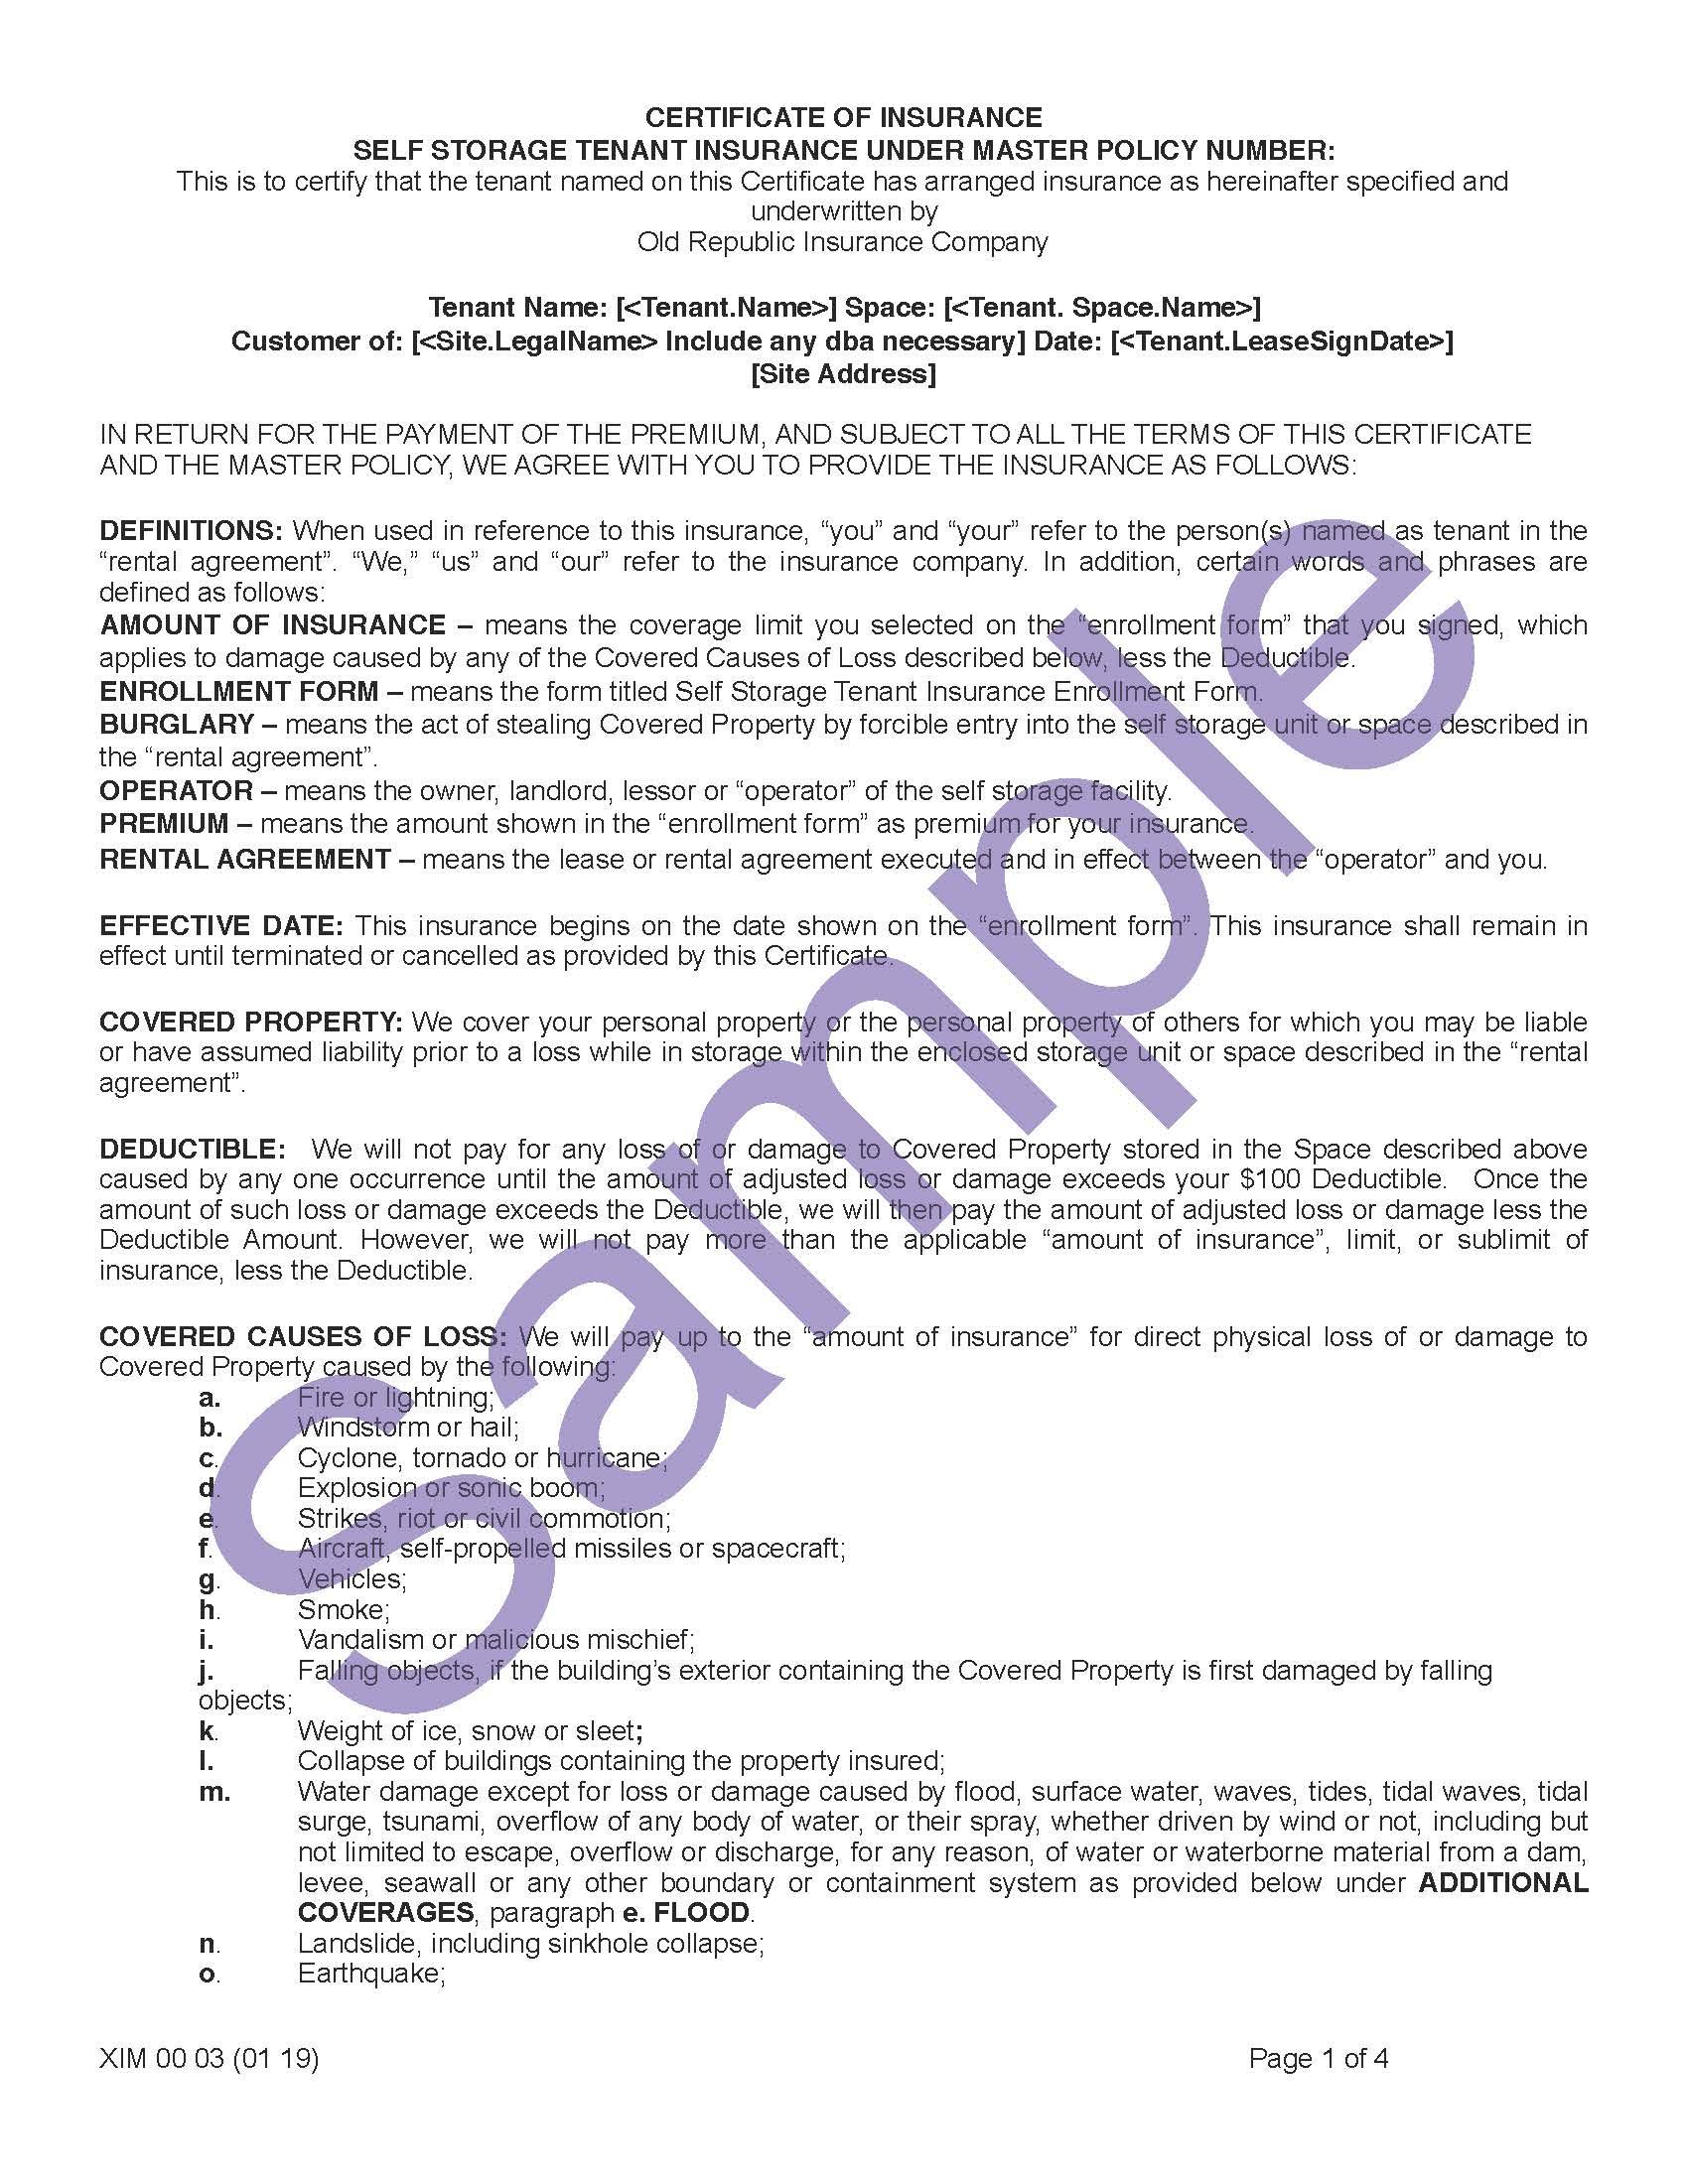 CW XIM 00 03 (01-19) Certificate of InsuranceSample_Page_1.jpg